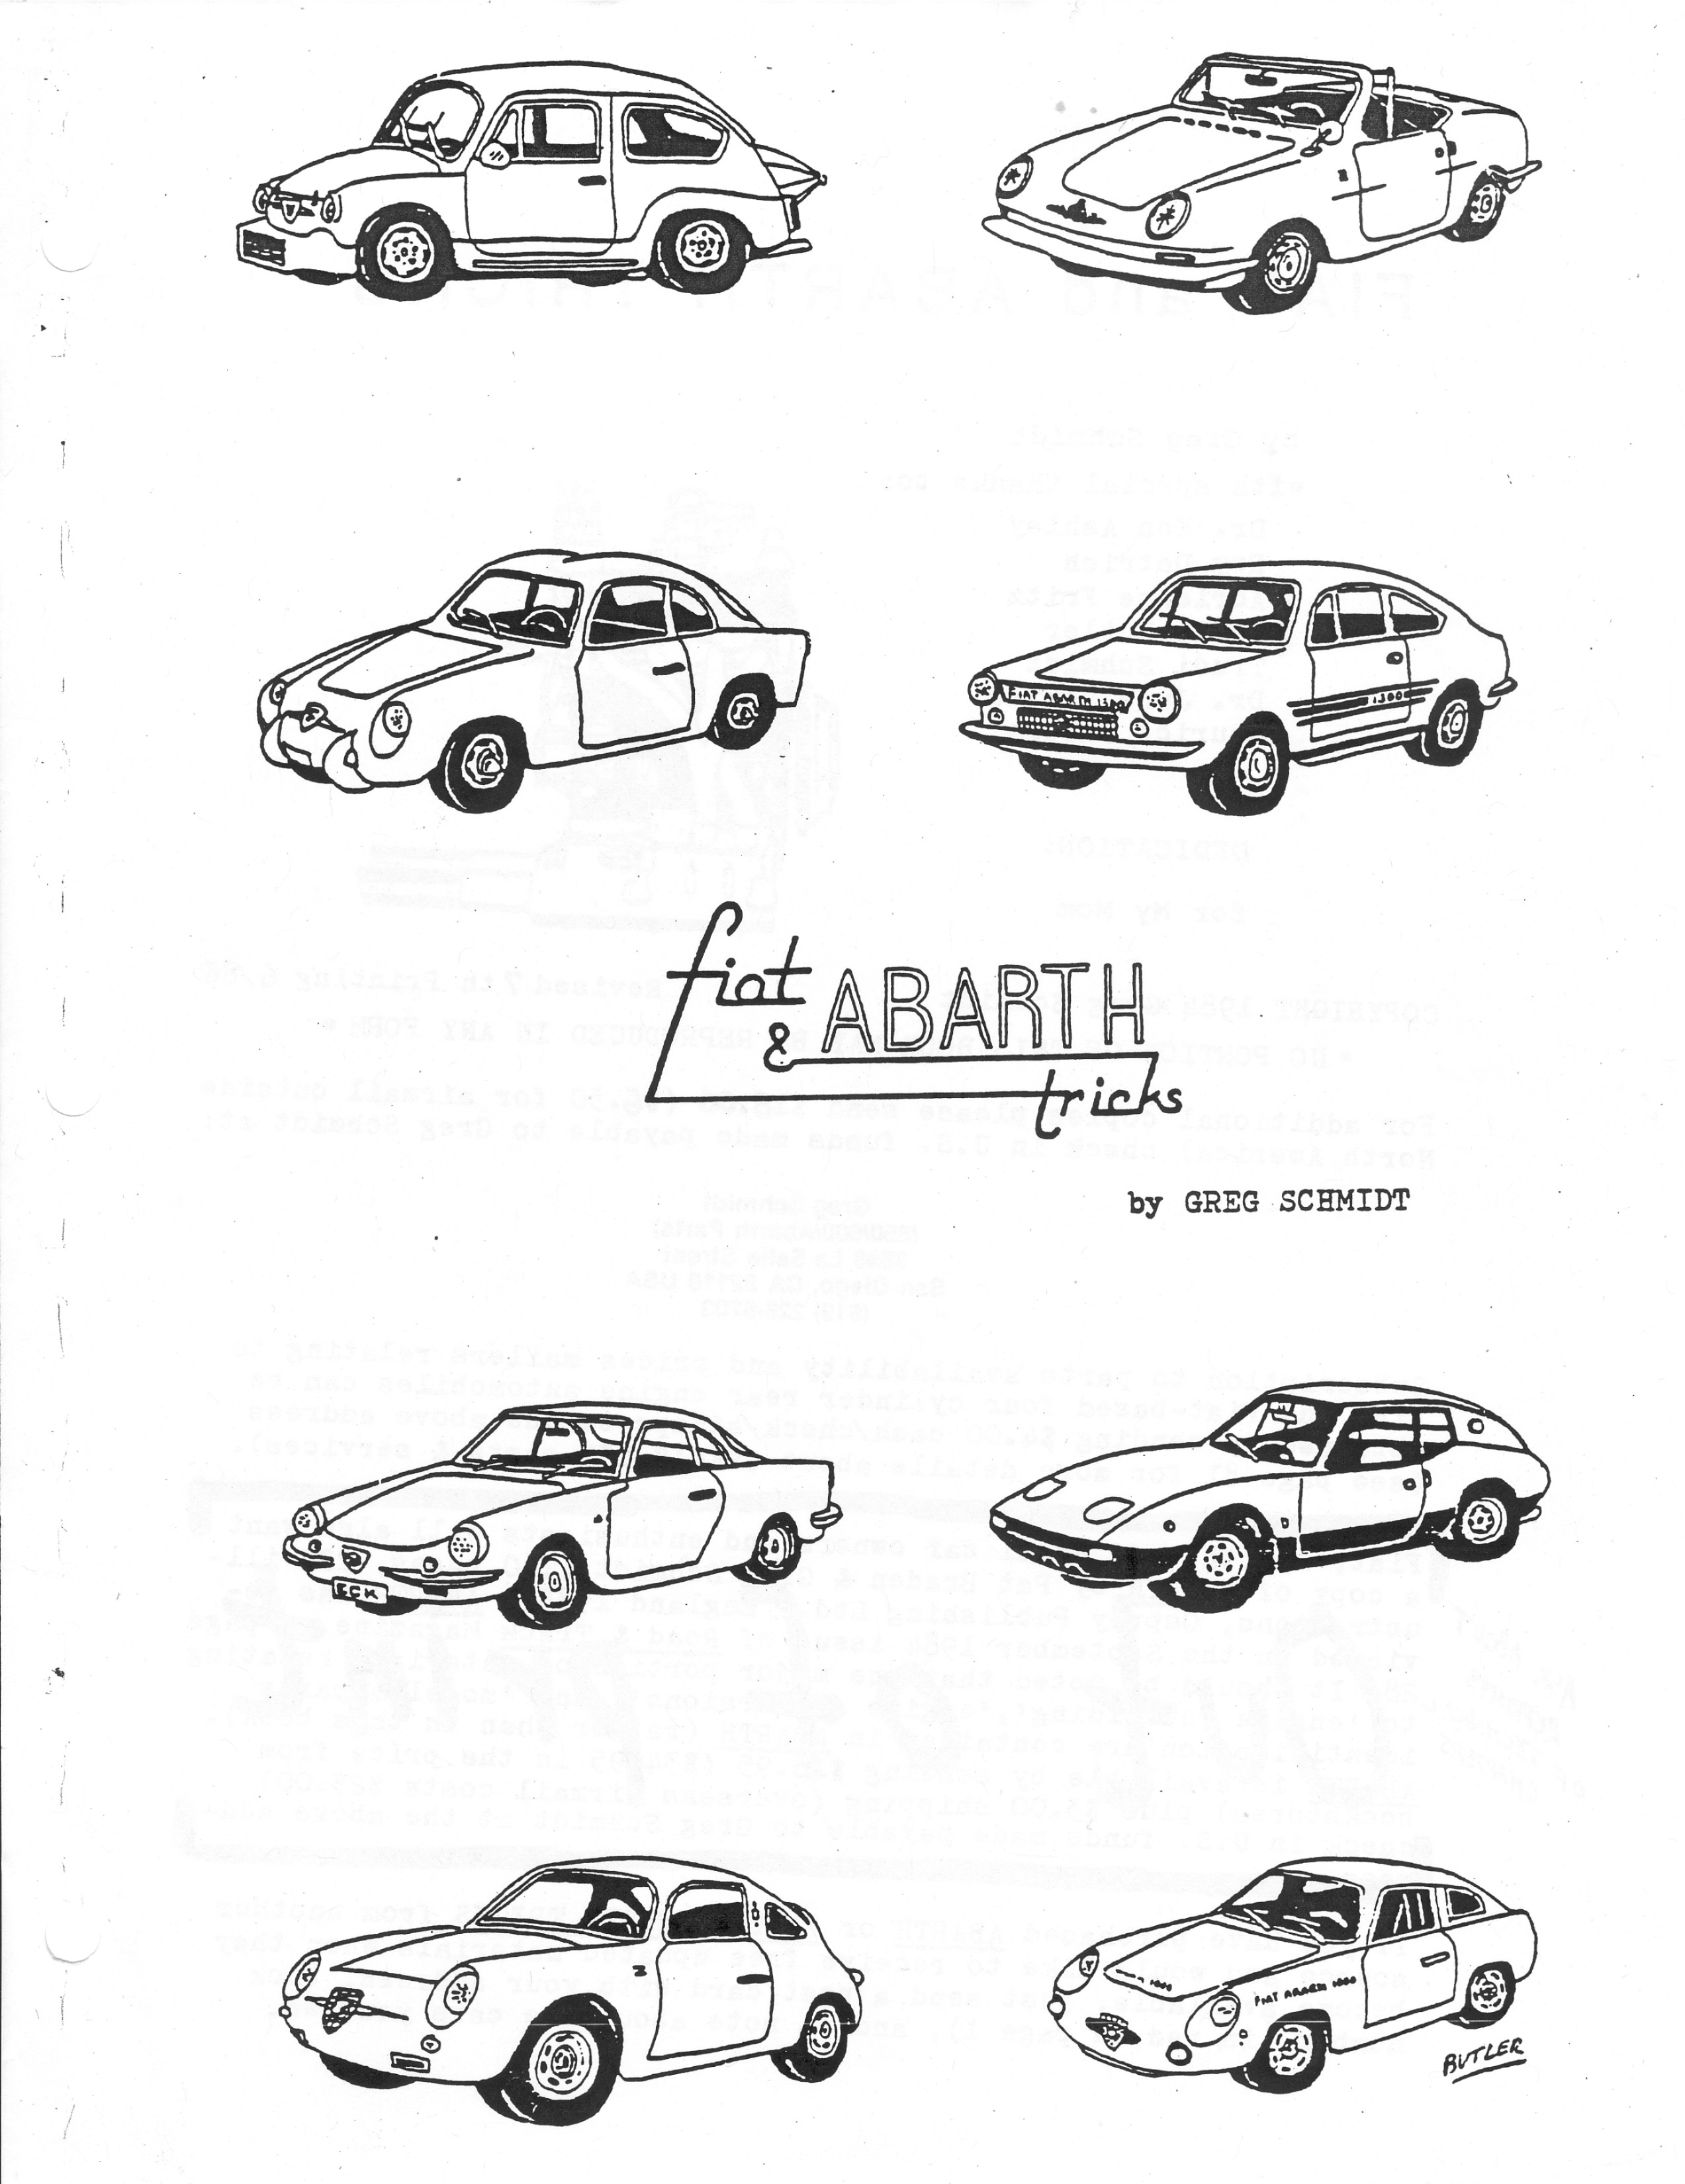 Fiat Amp Abarth Books And Literature